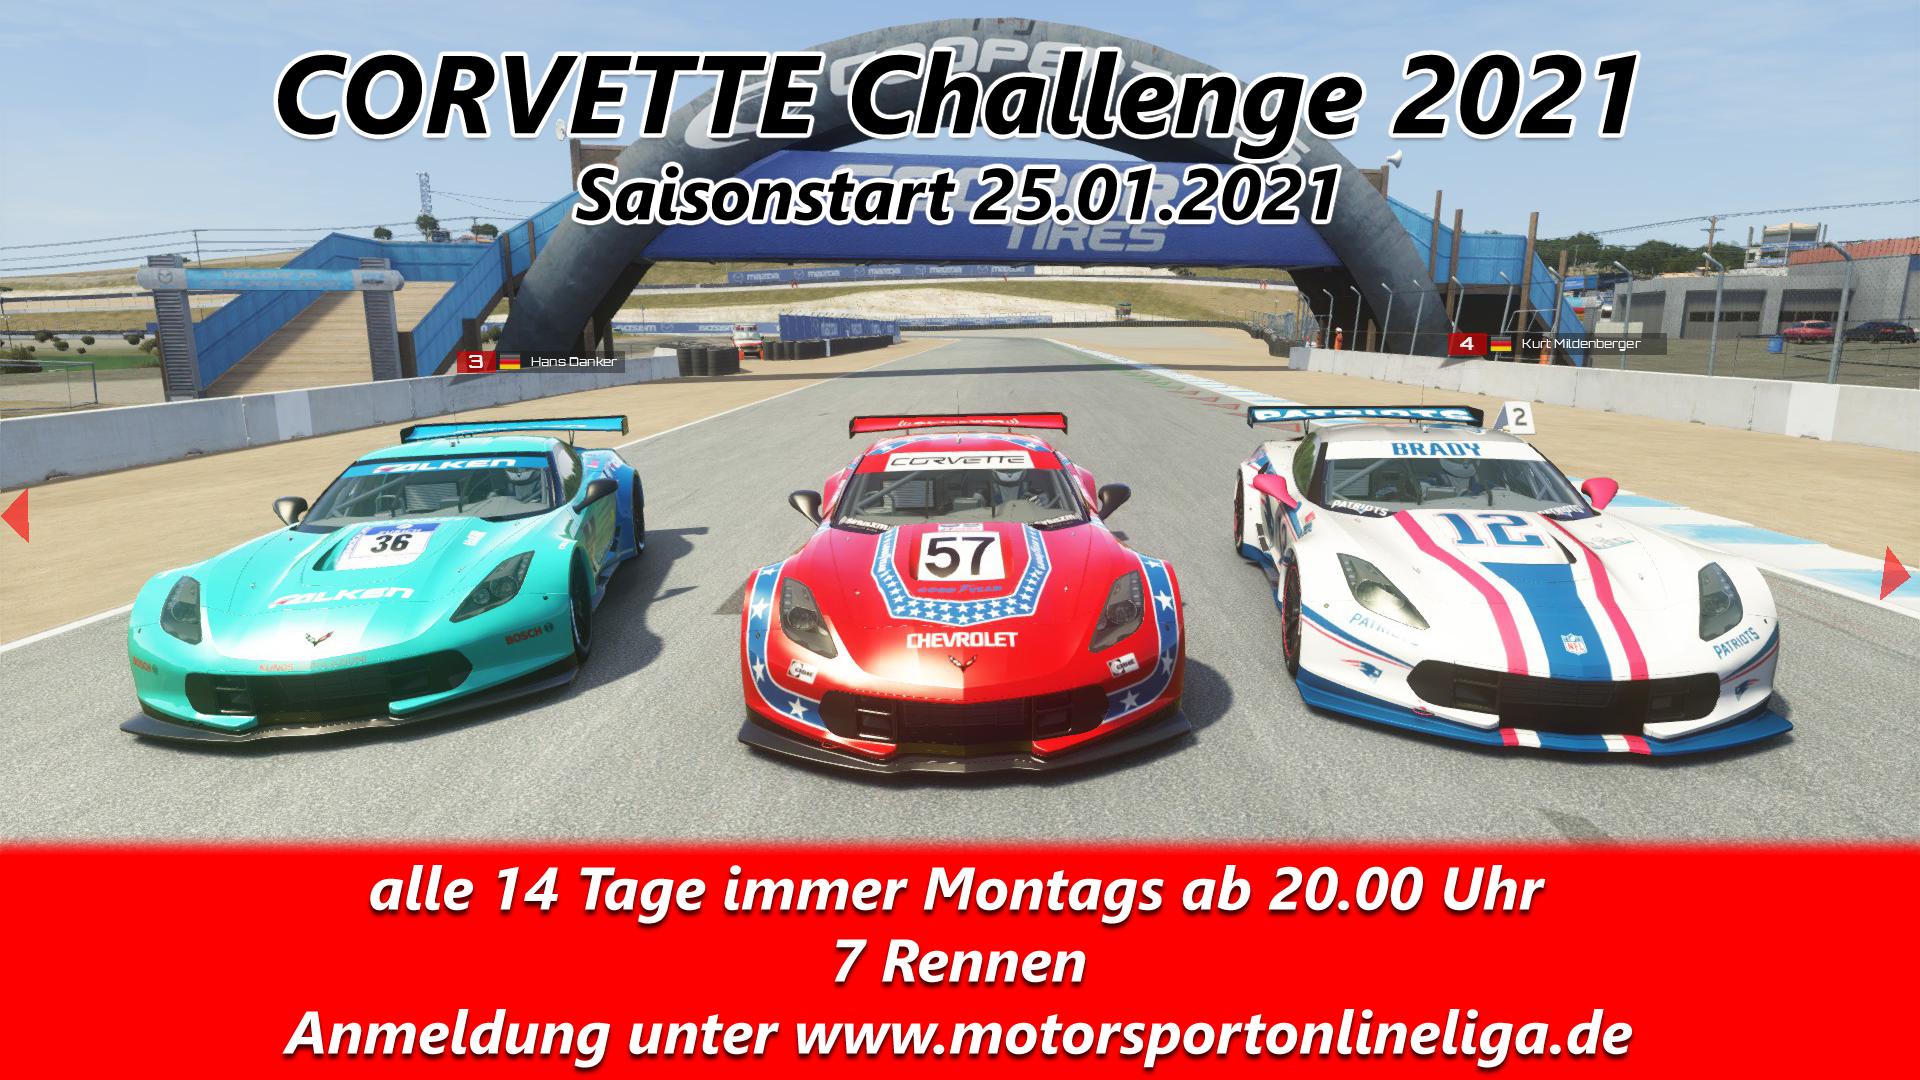 Corvette Challenge 2021 Plakat.png